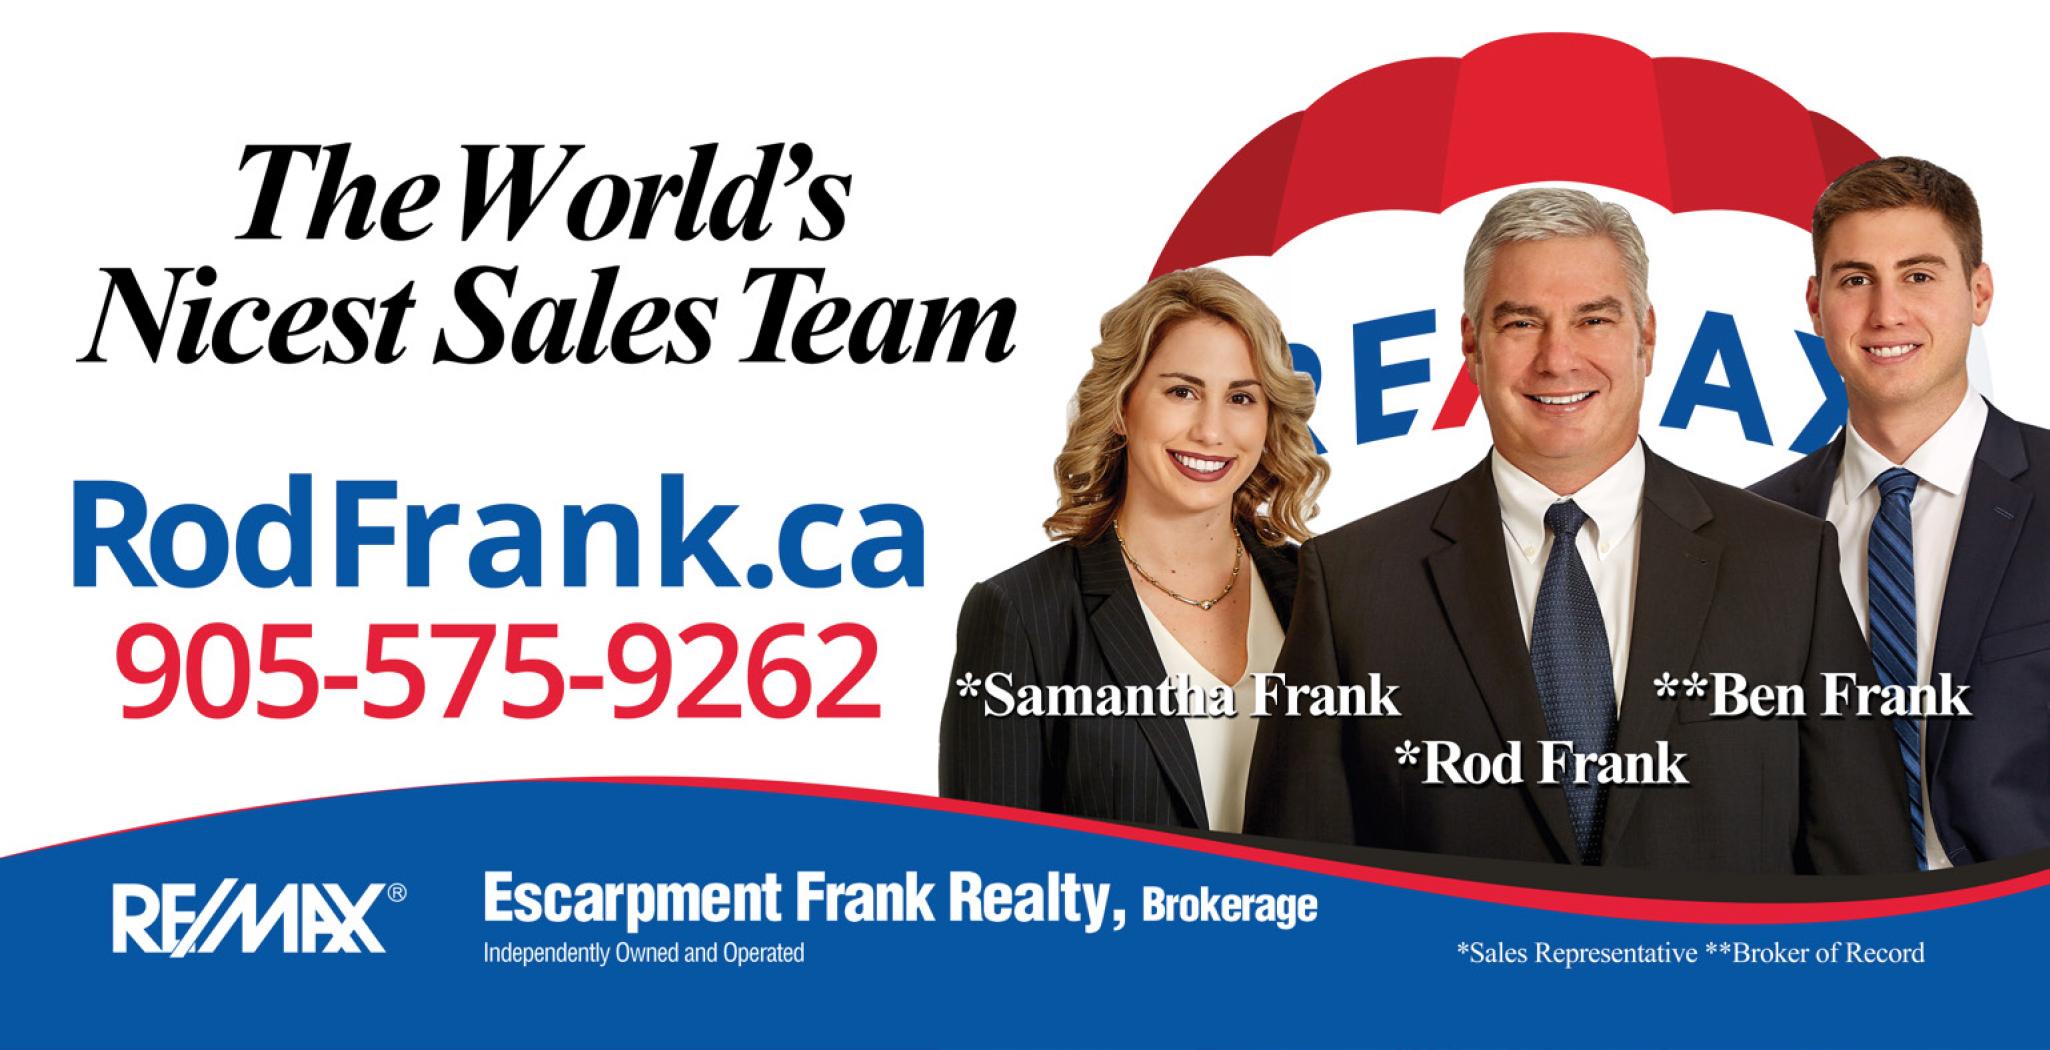 RodFrank.ca